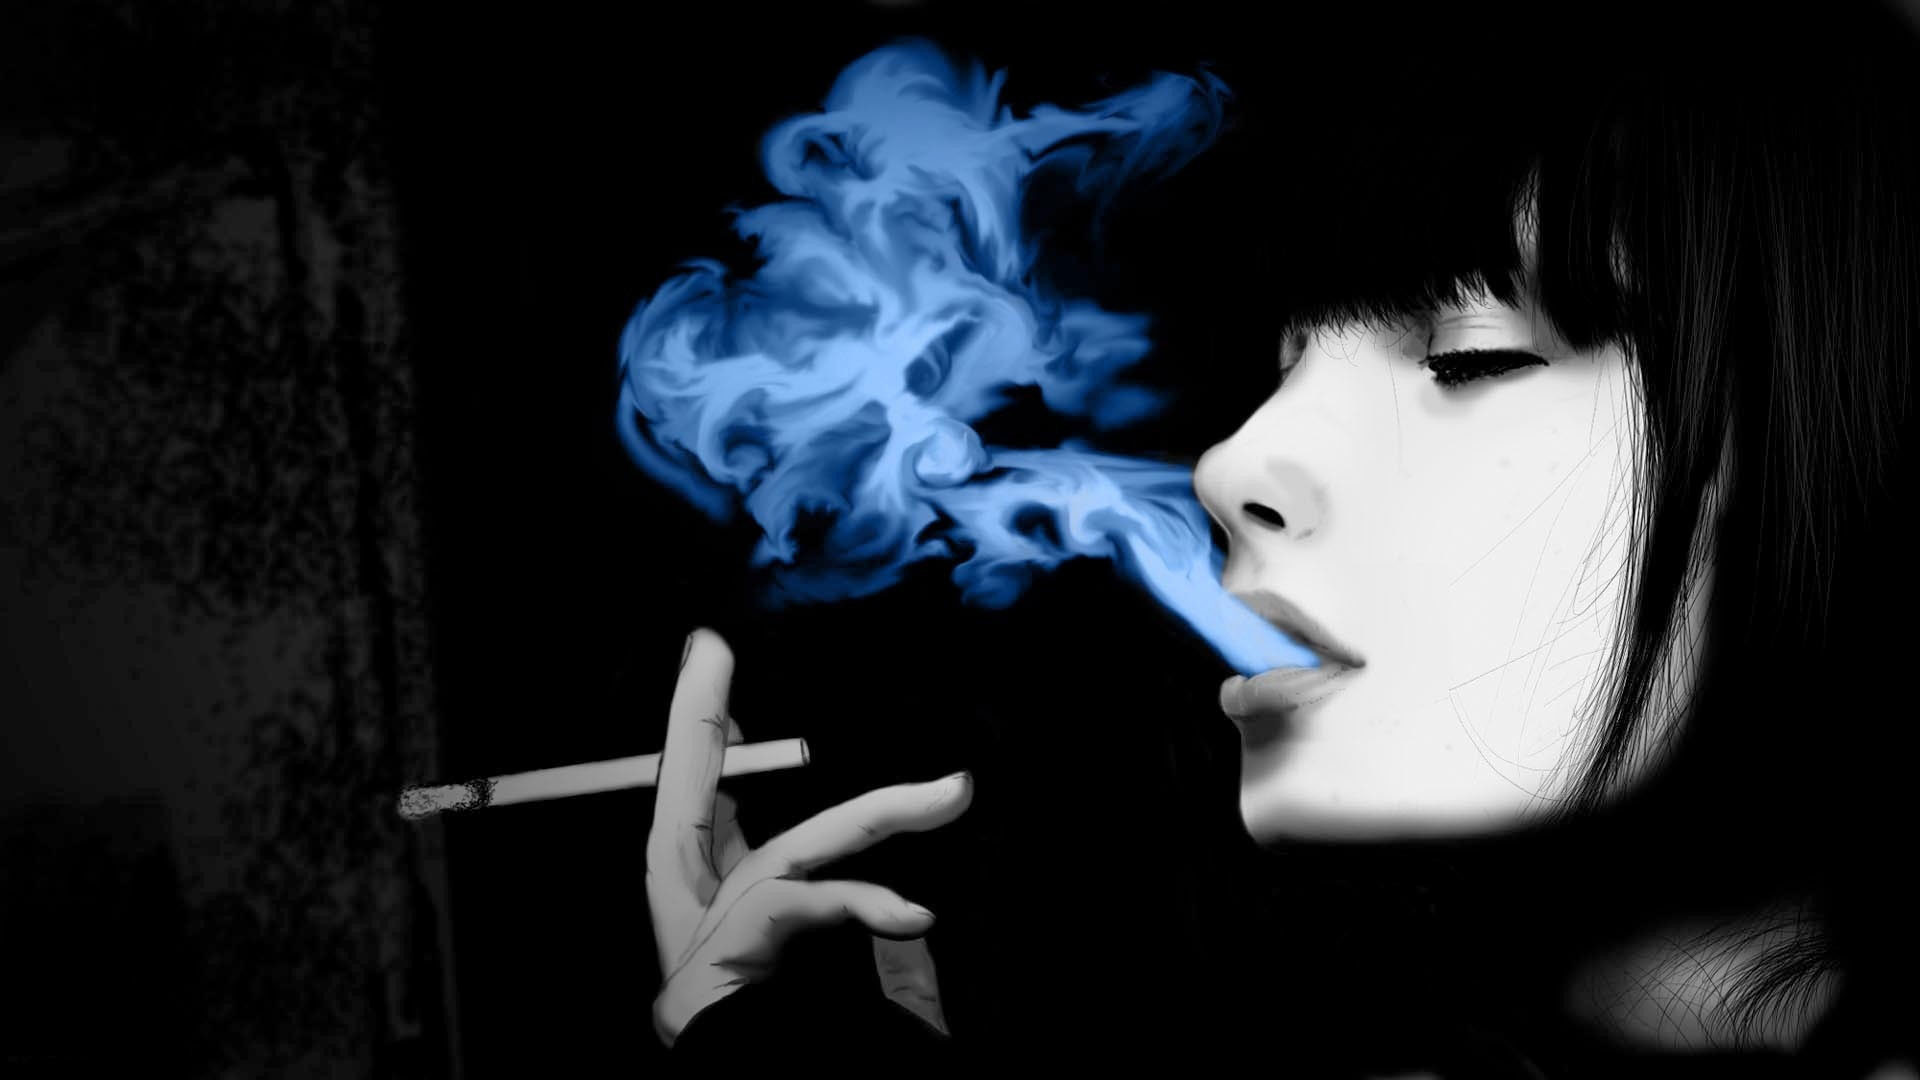 hd pics photos attractive girl smoking blue smoke animated hd quality  desktop background wallpaper